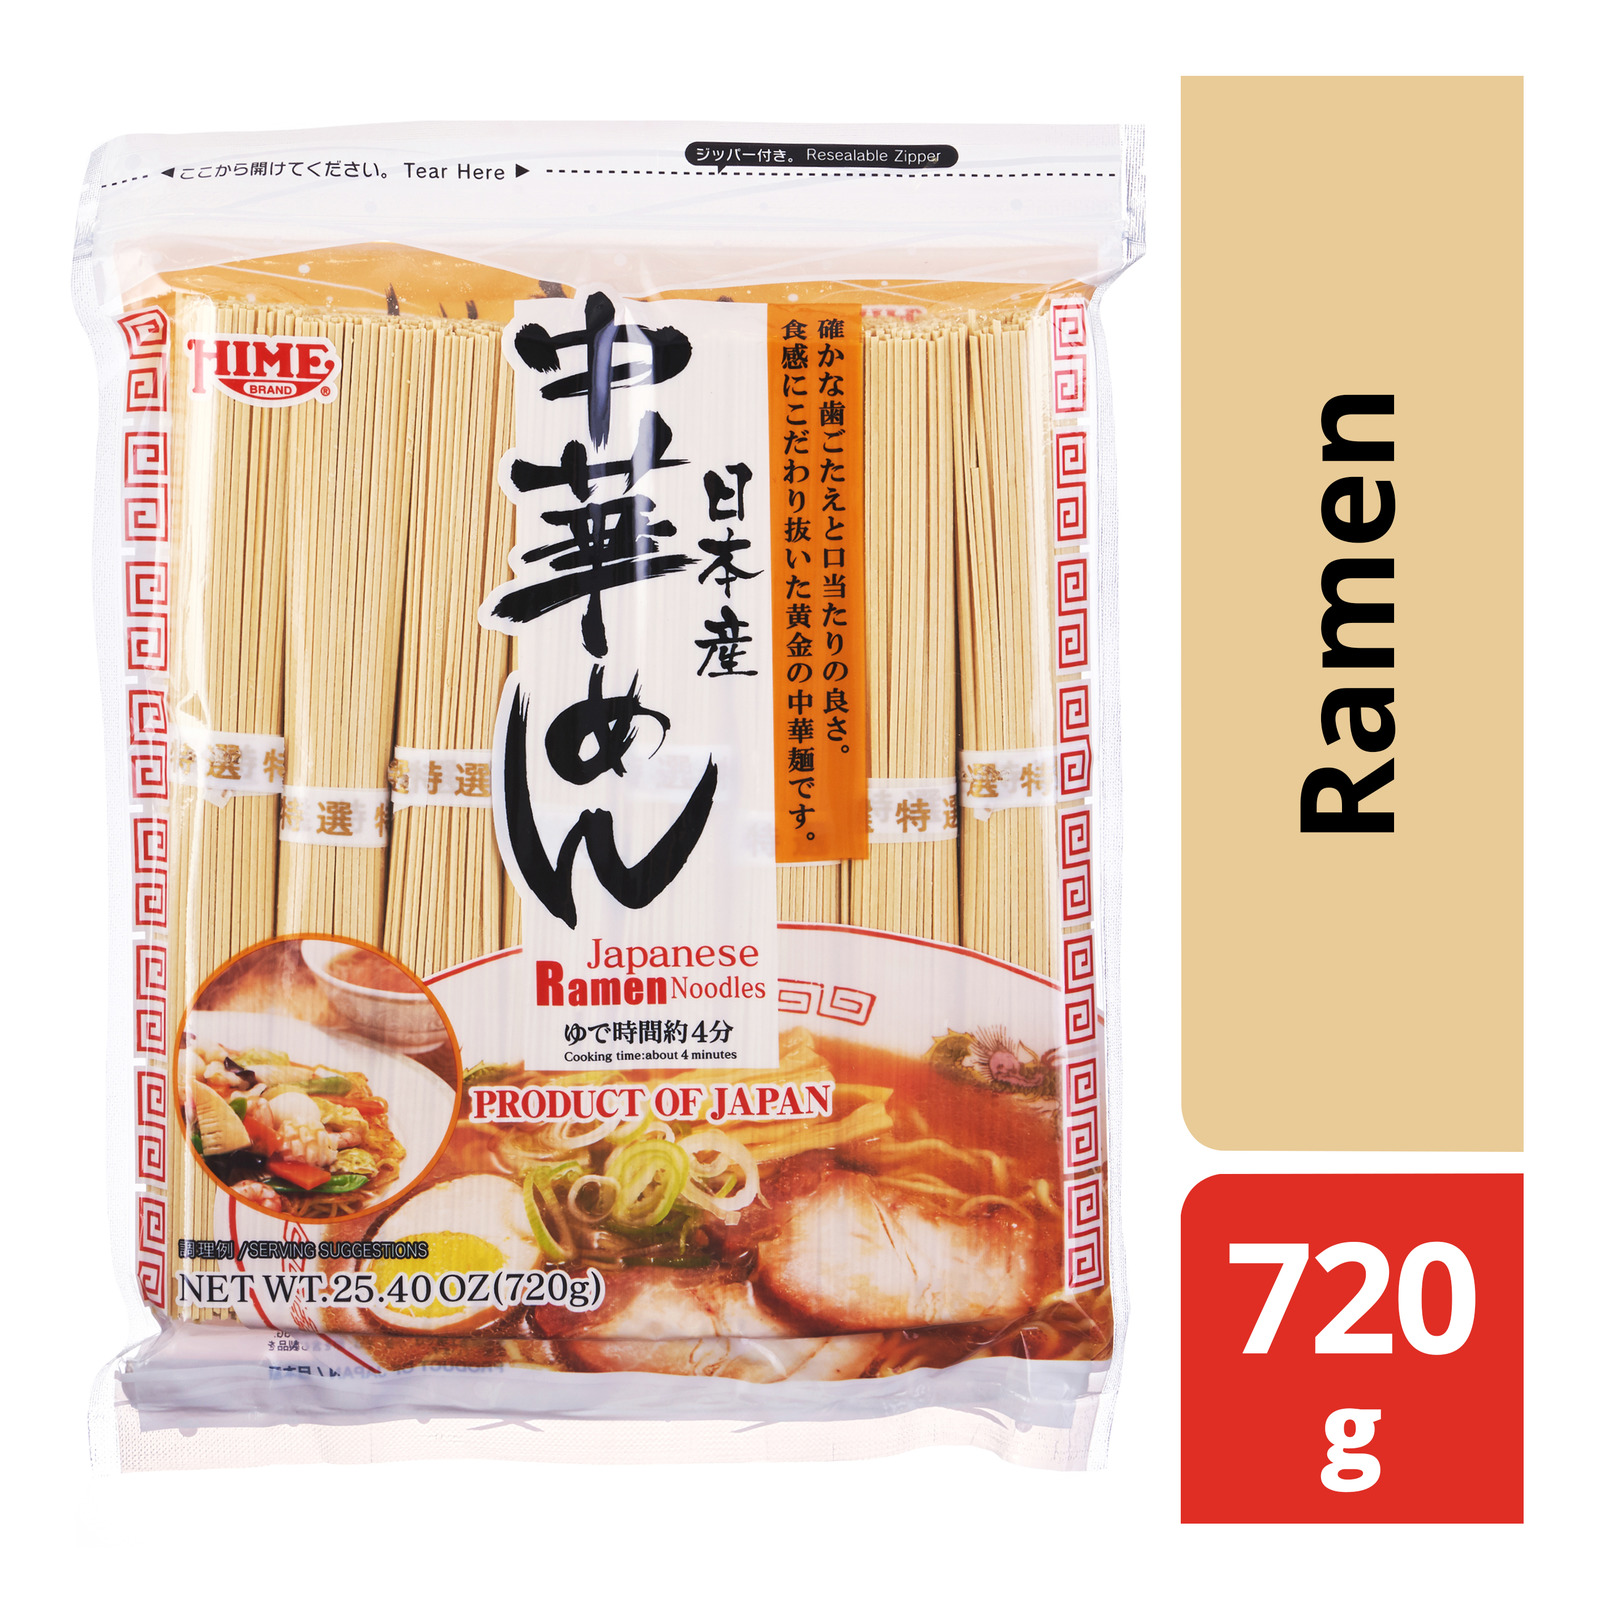 Hime Japanese Noodles - Ramen